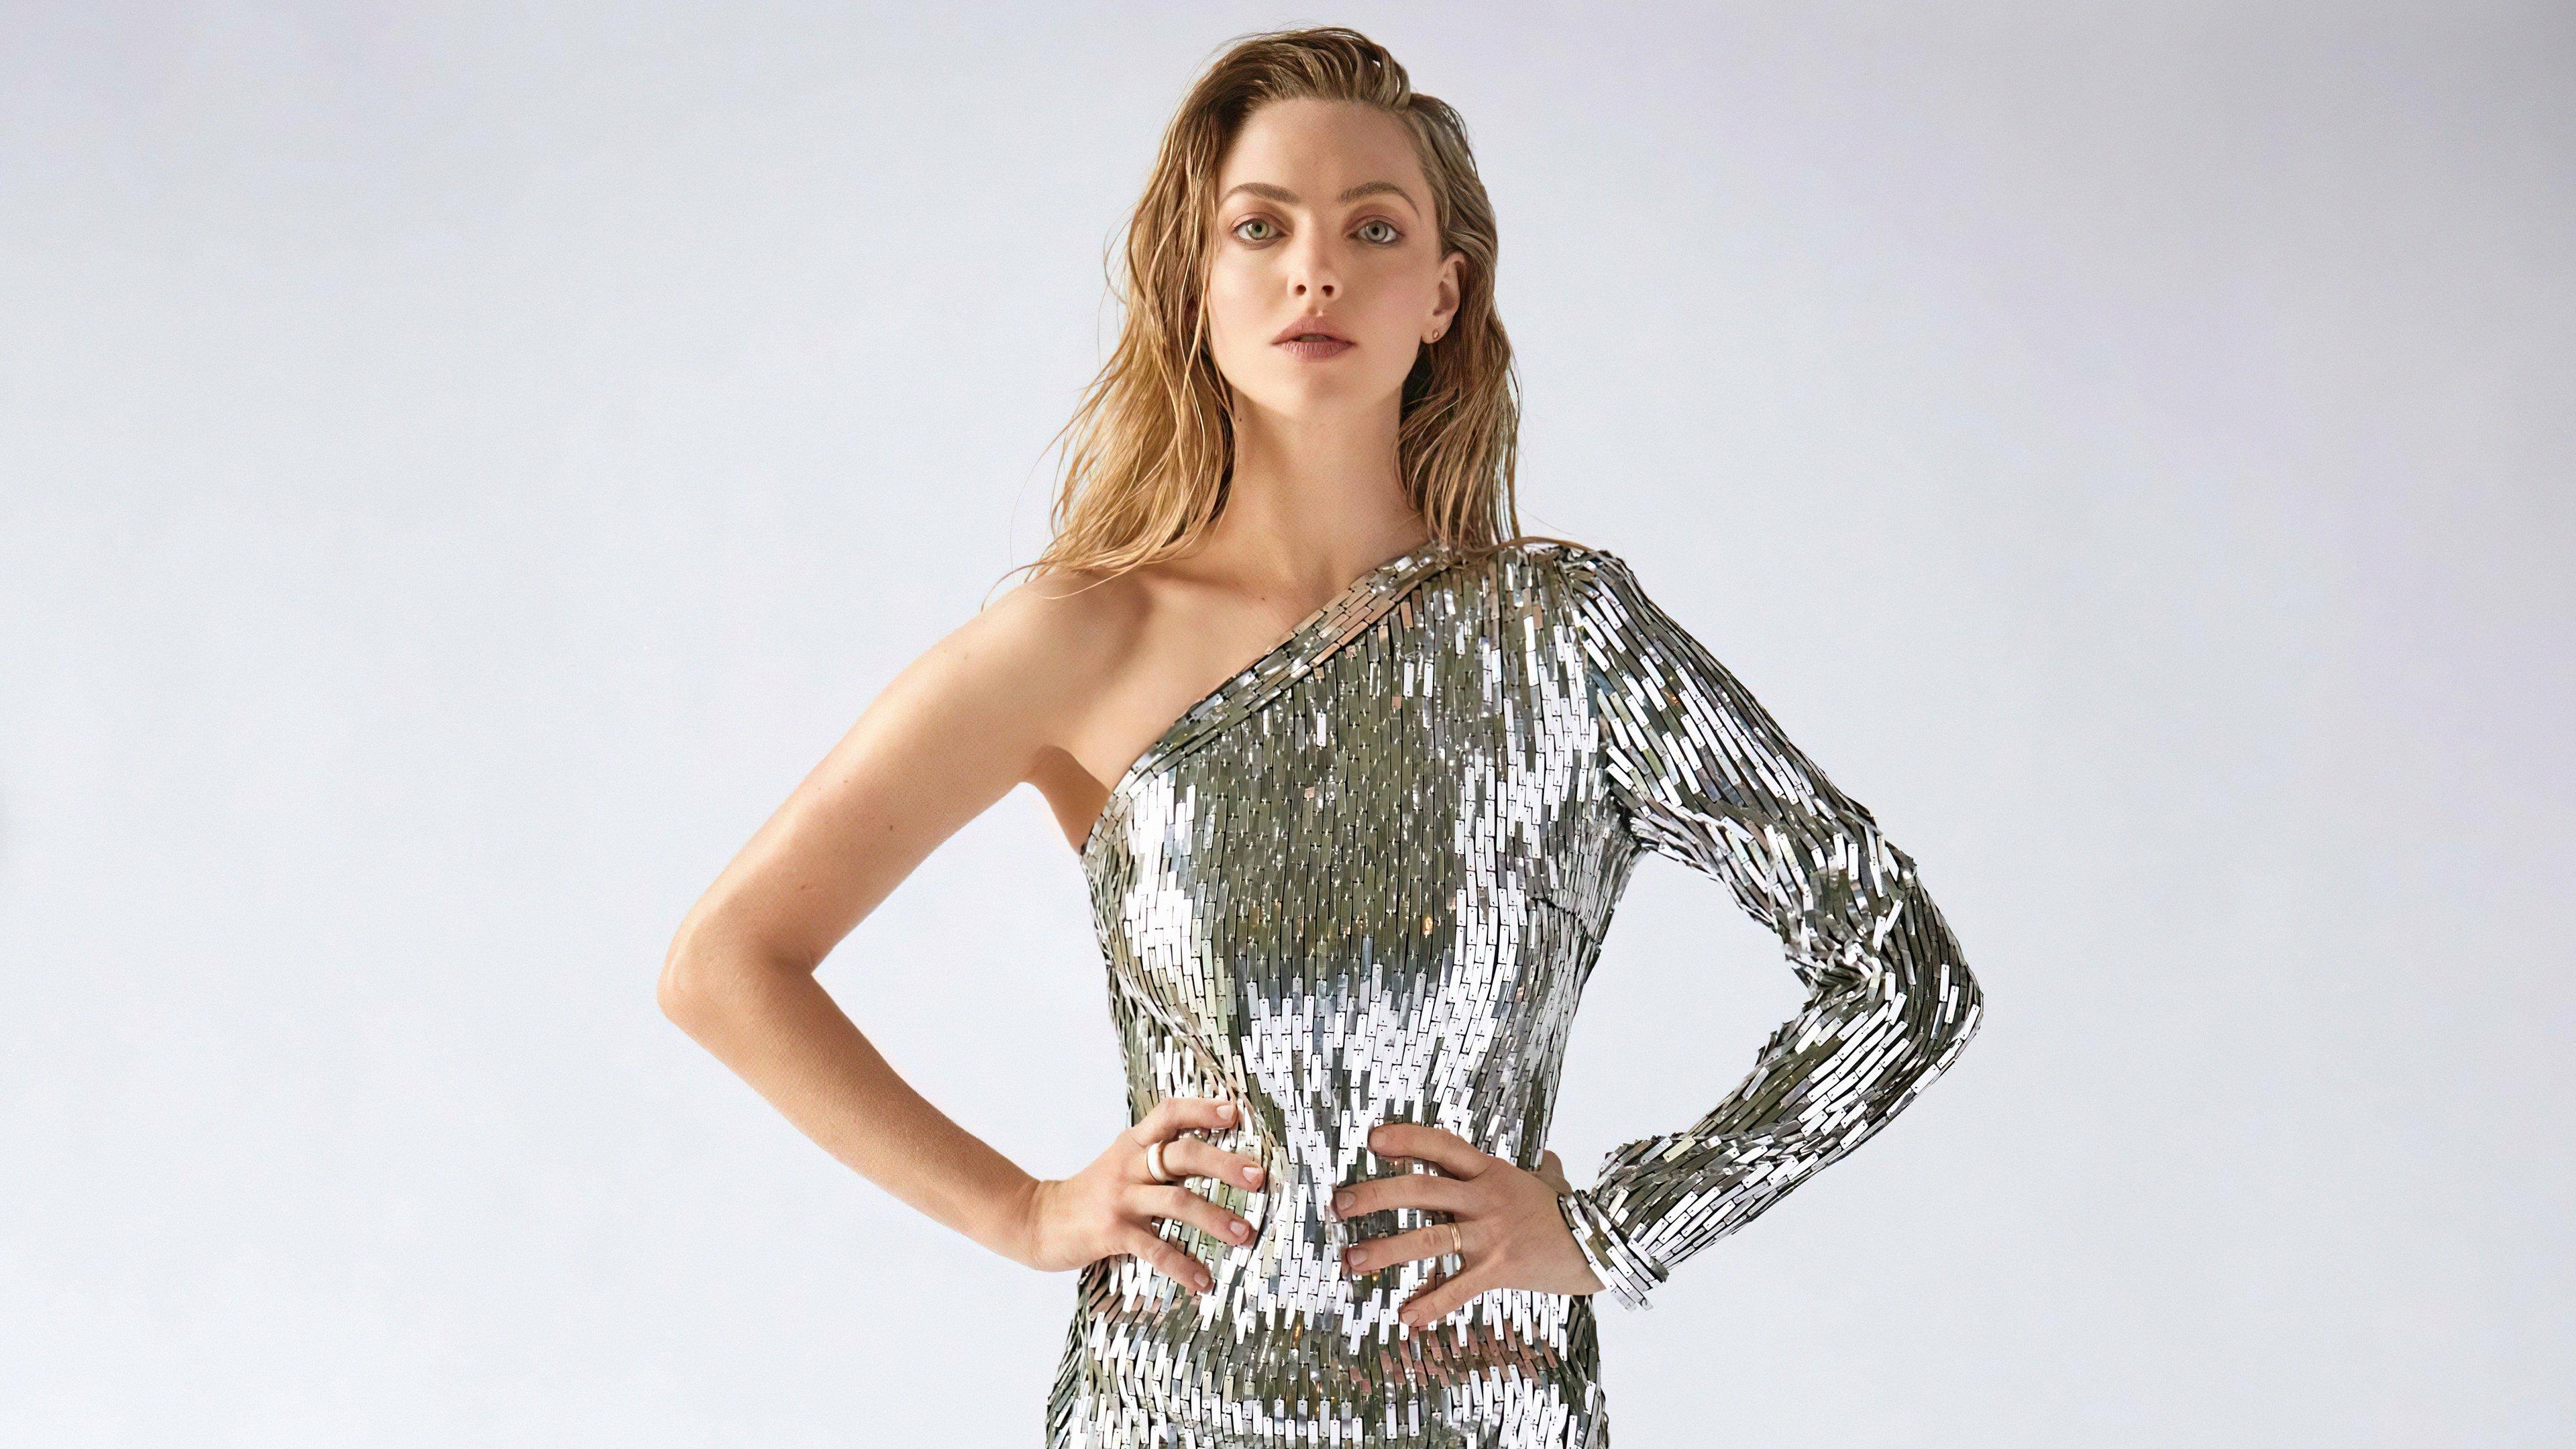 Fondos de pantalla Amanda Seyfried vestido plateado